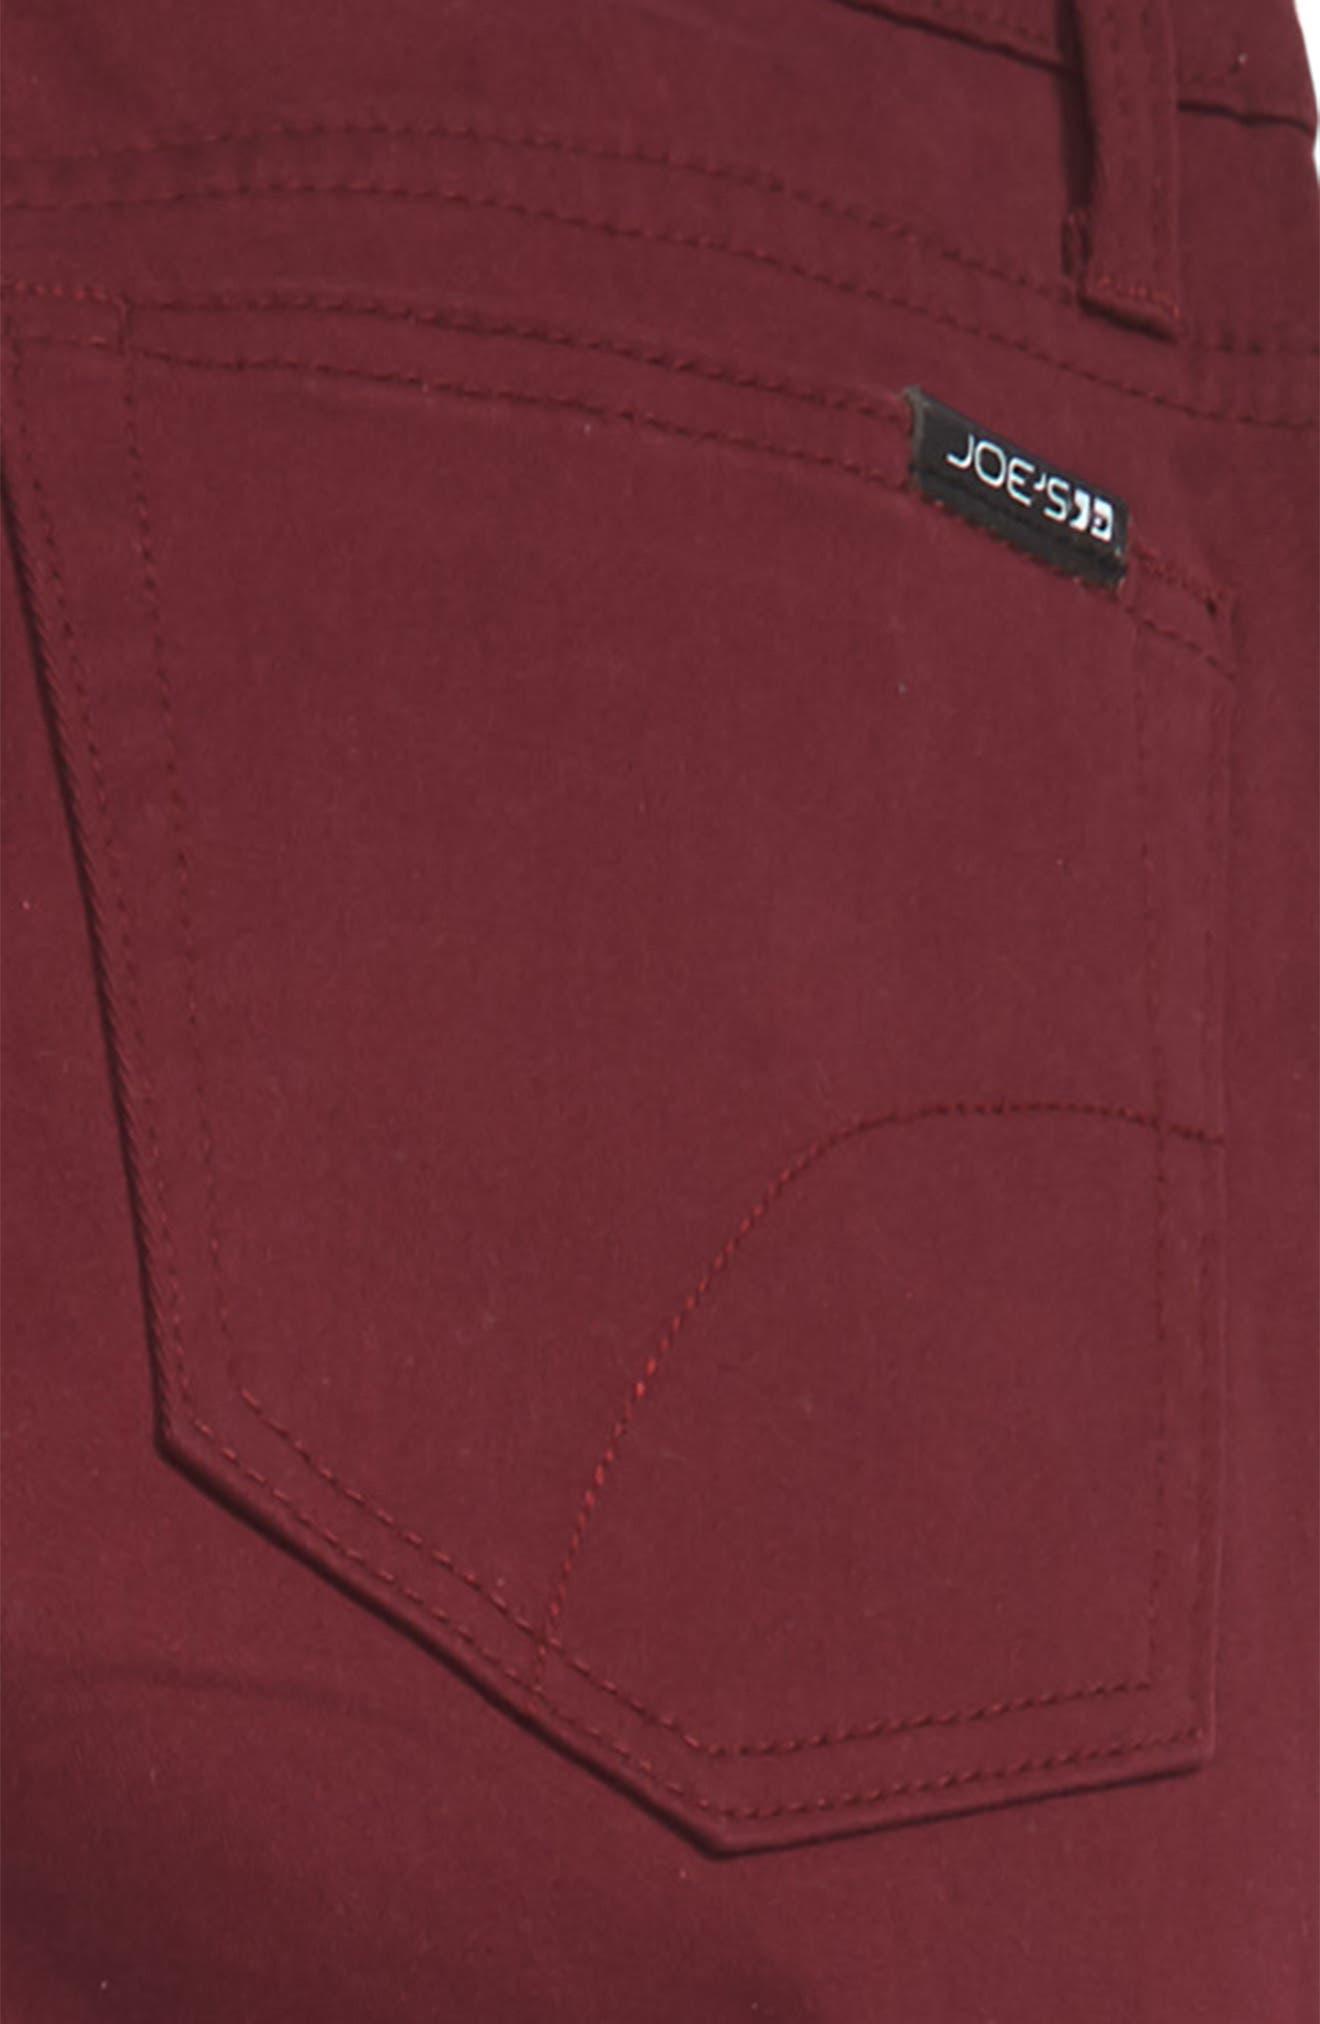 Brixton Straight Leg Stretch Twill Pants,                             Alternate thumbnail 3, color,                             WINE